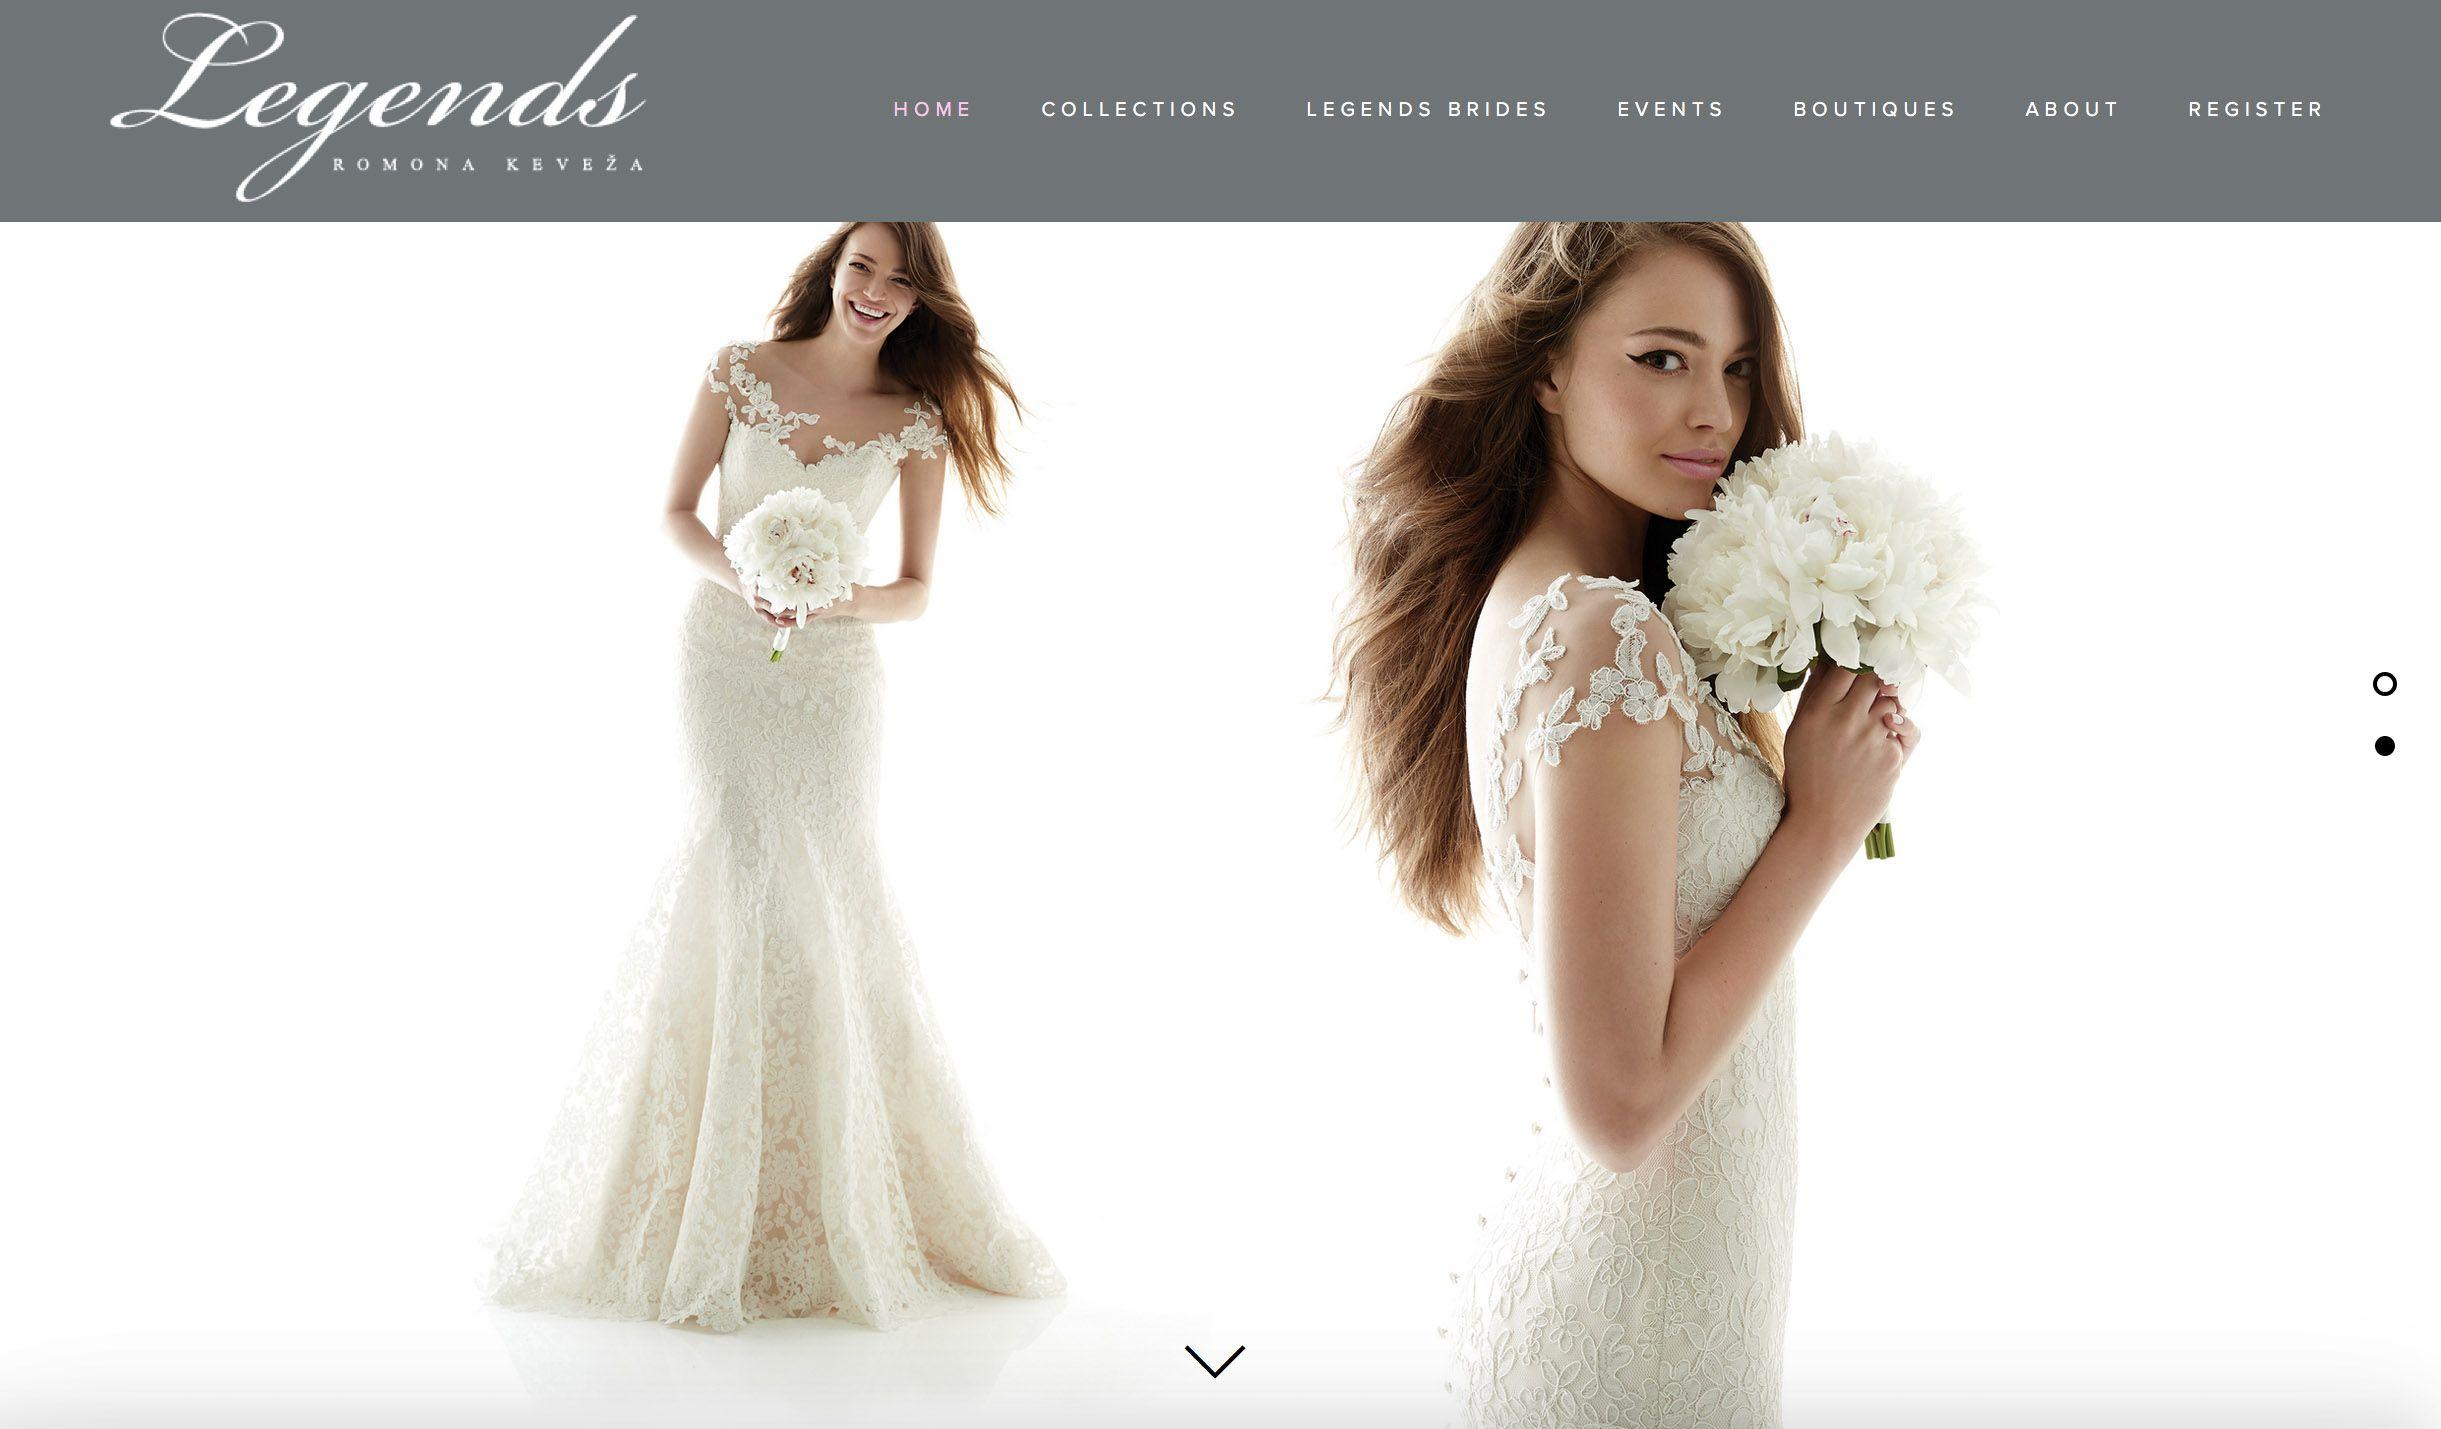 Legends by romono keveza wedding dress designer bridal wedding